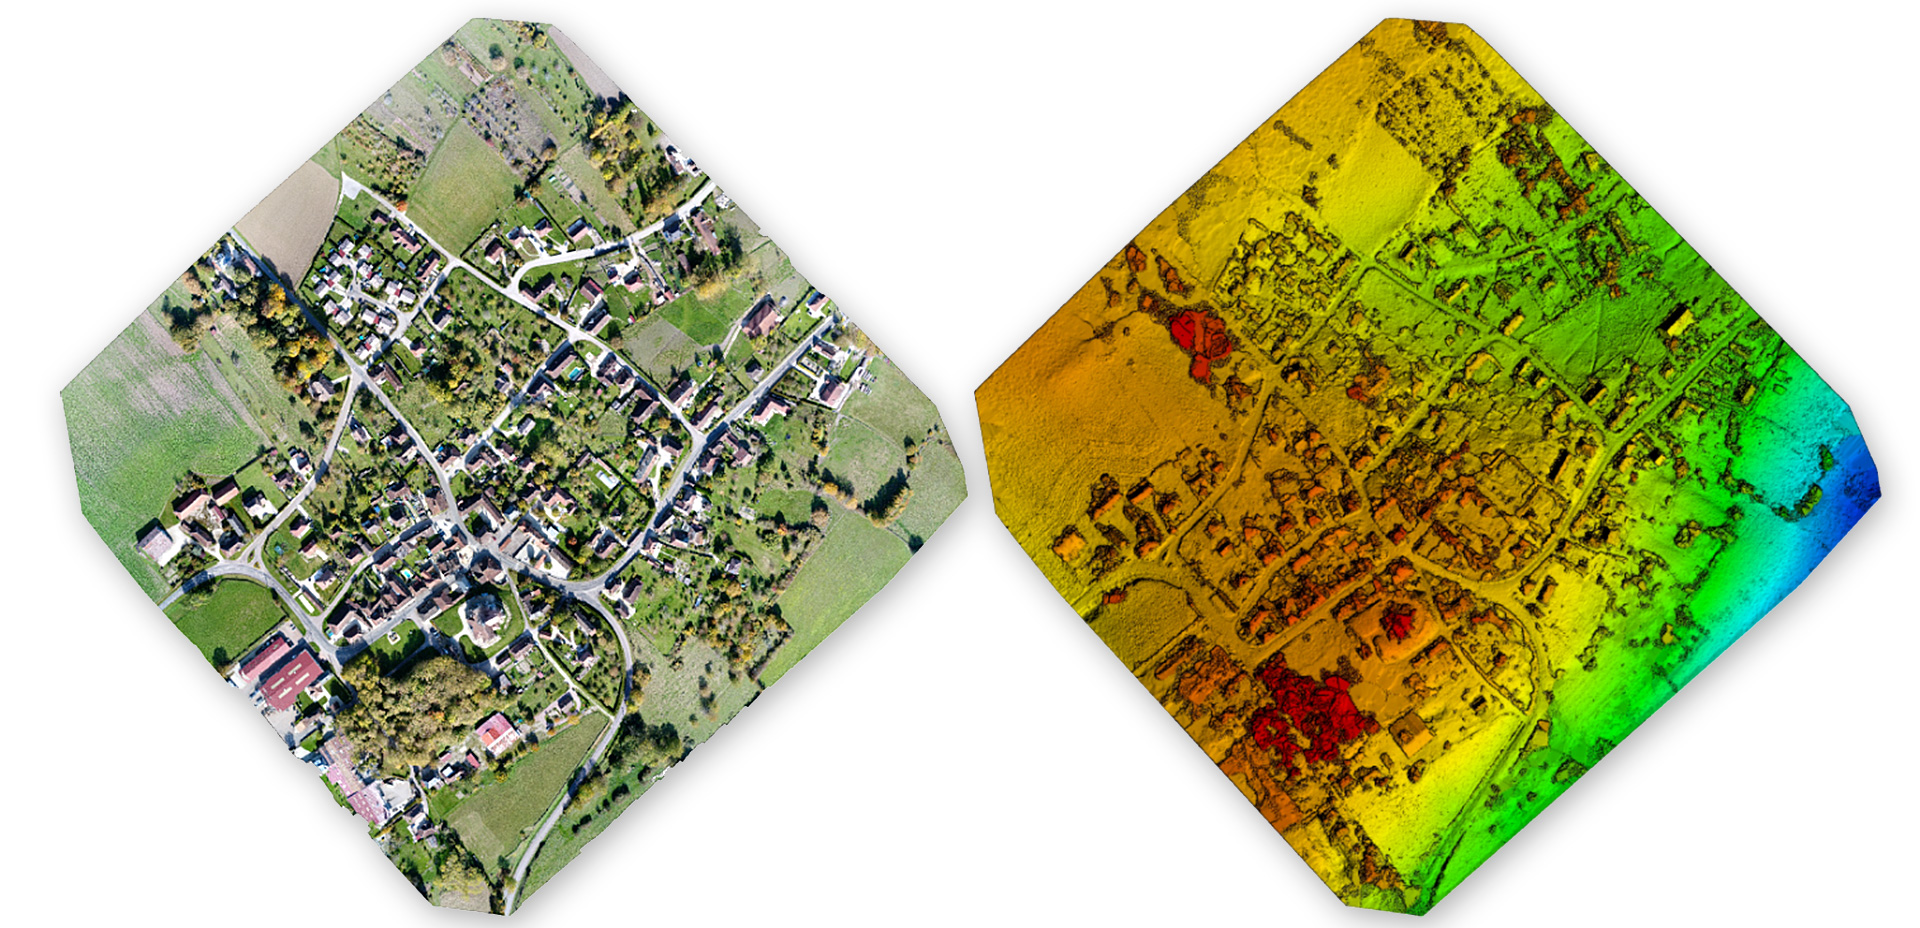 plan local d'urbanisme - Local Urbanism Plan